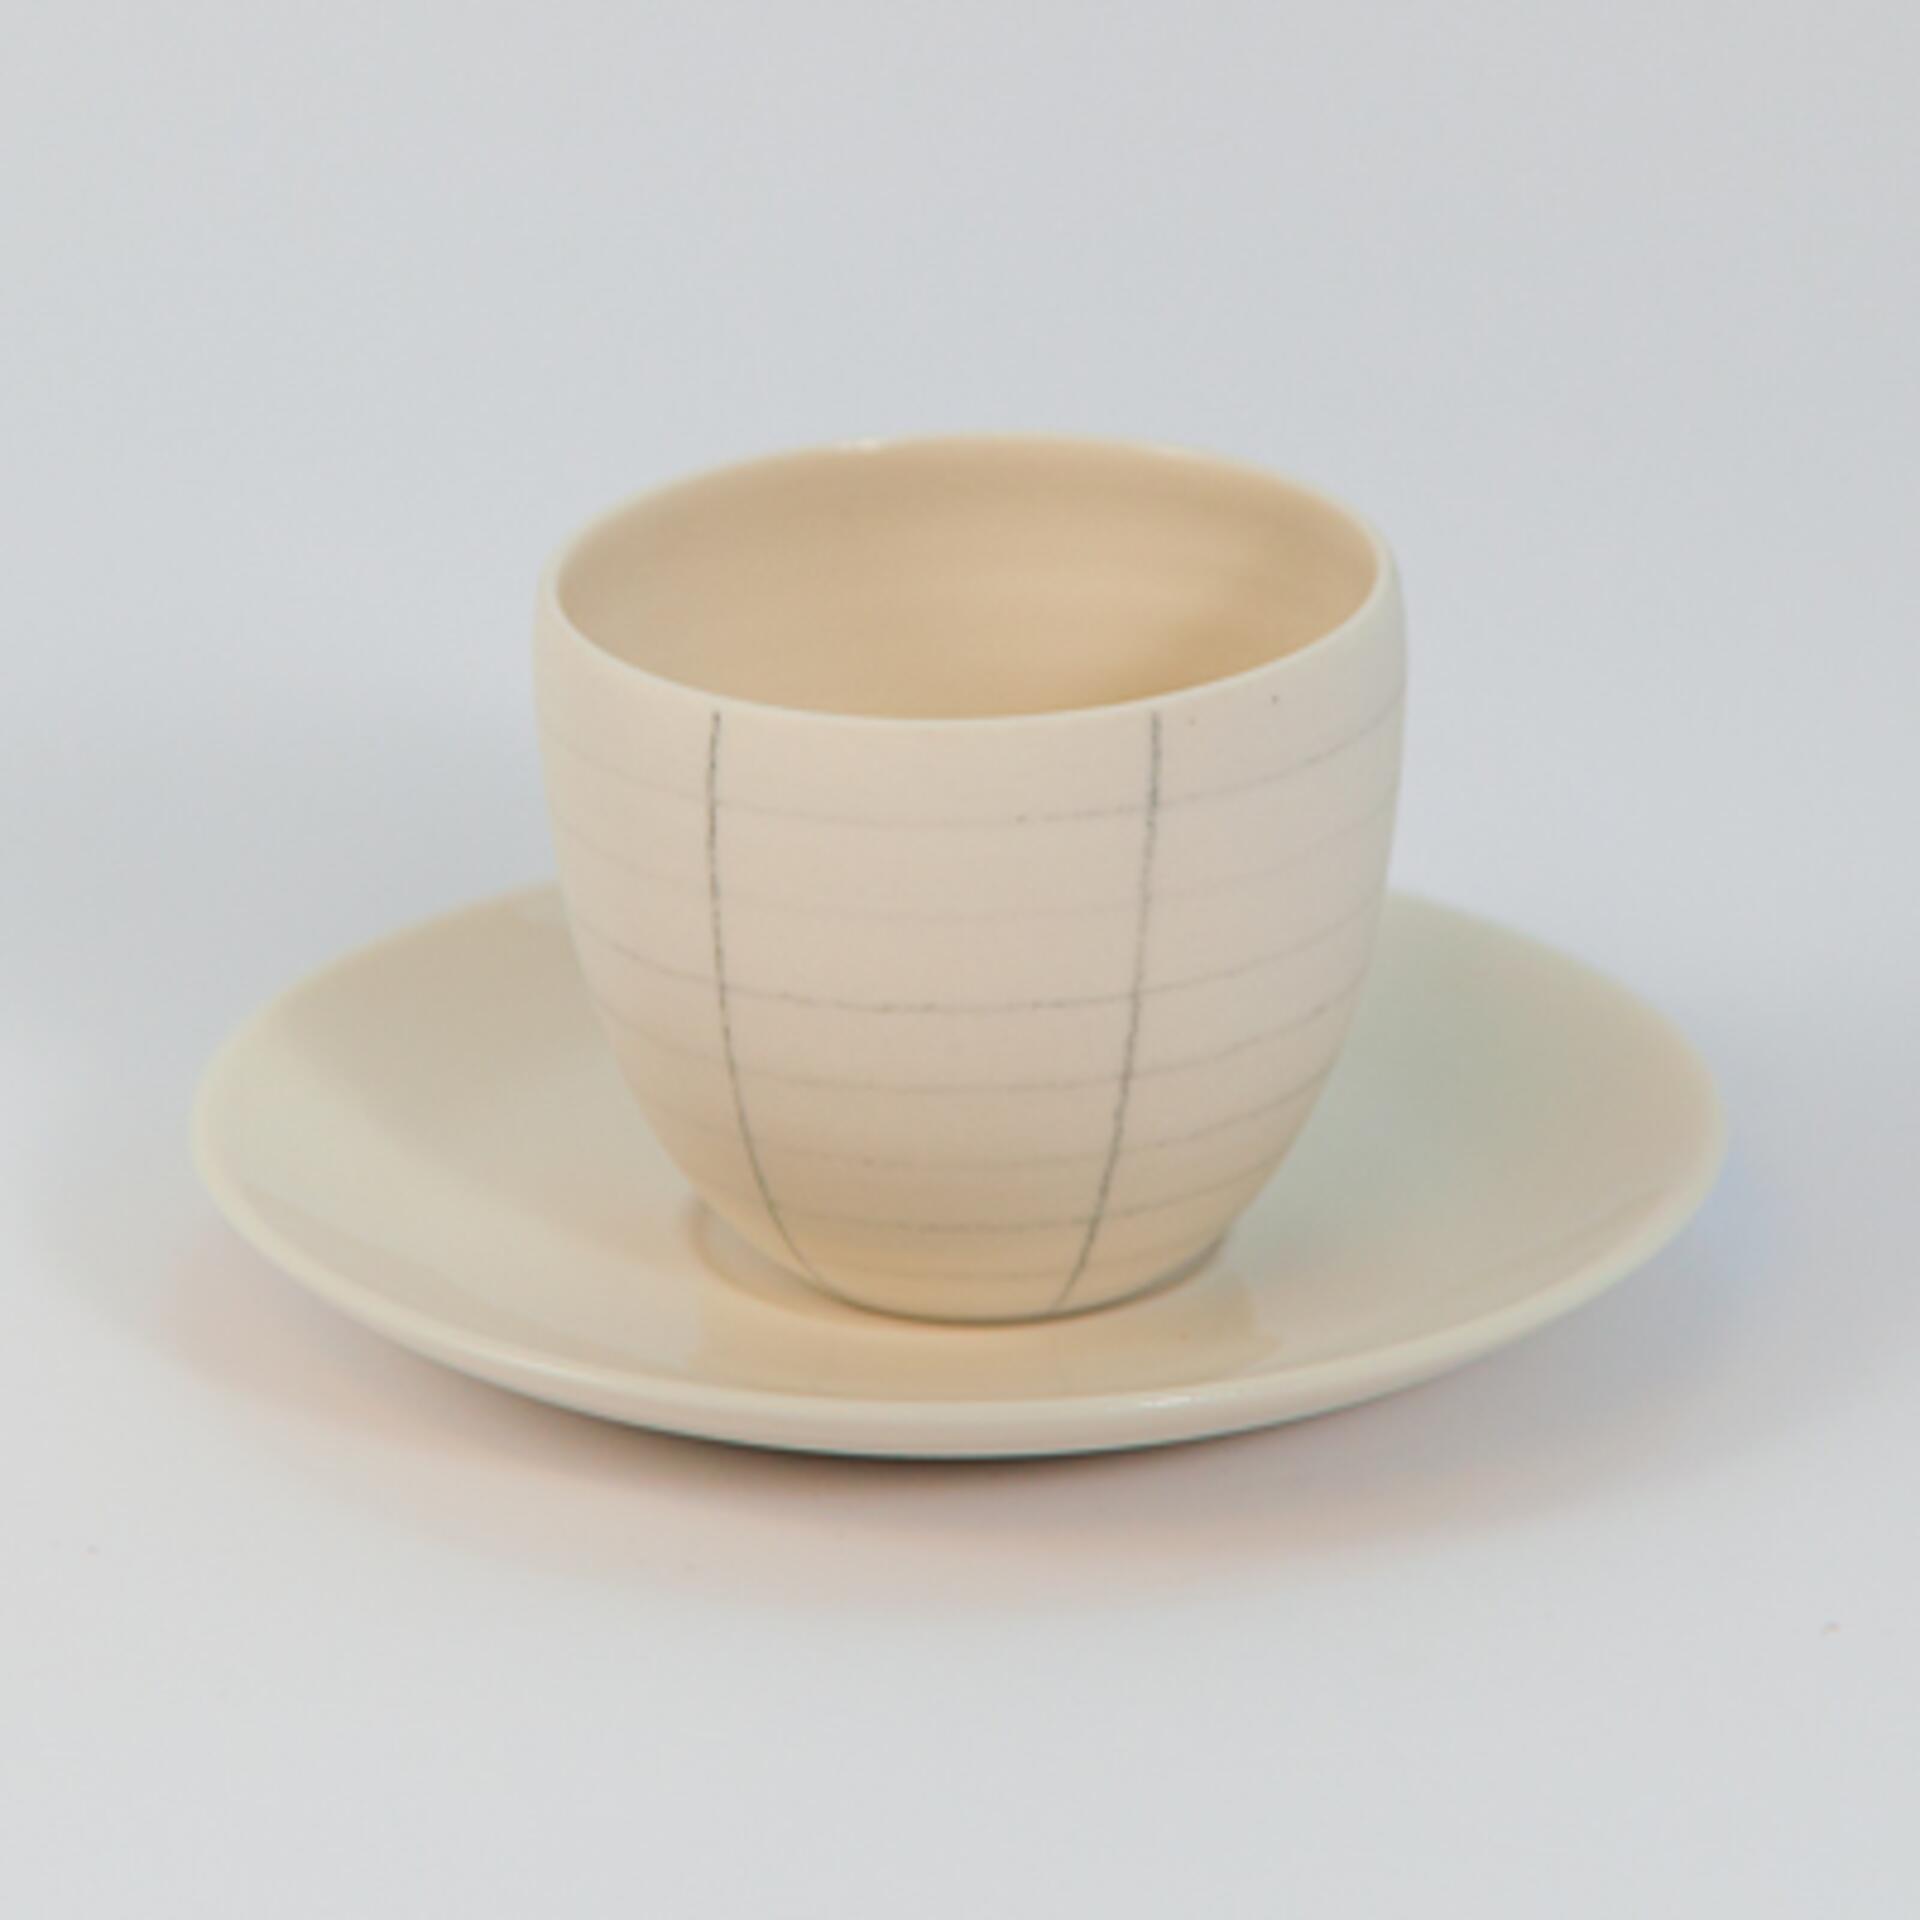 Schoemig Porzellan Espressotasse Graph Rechteck 2